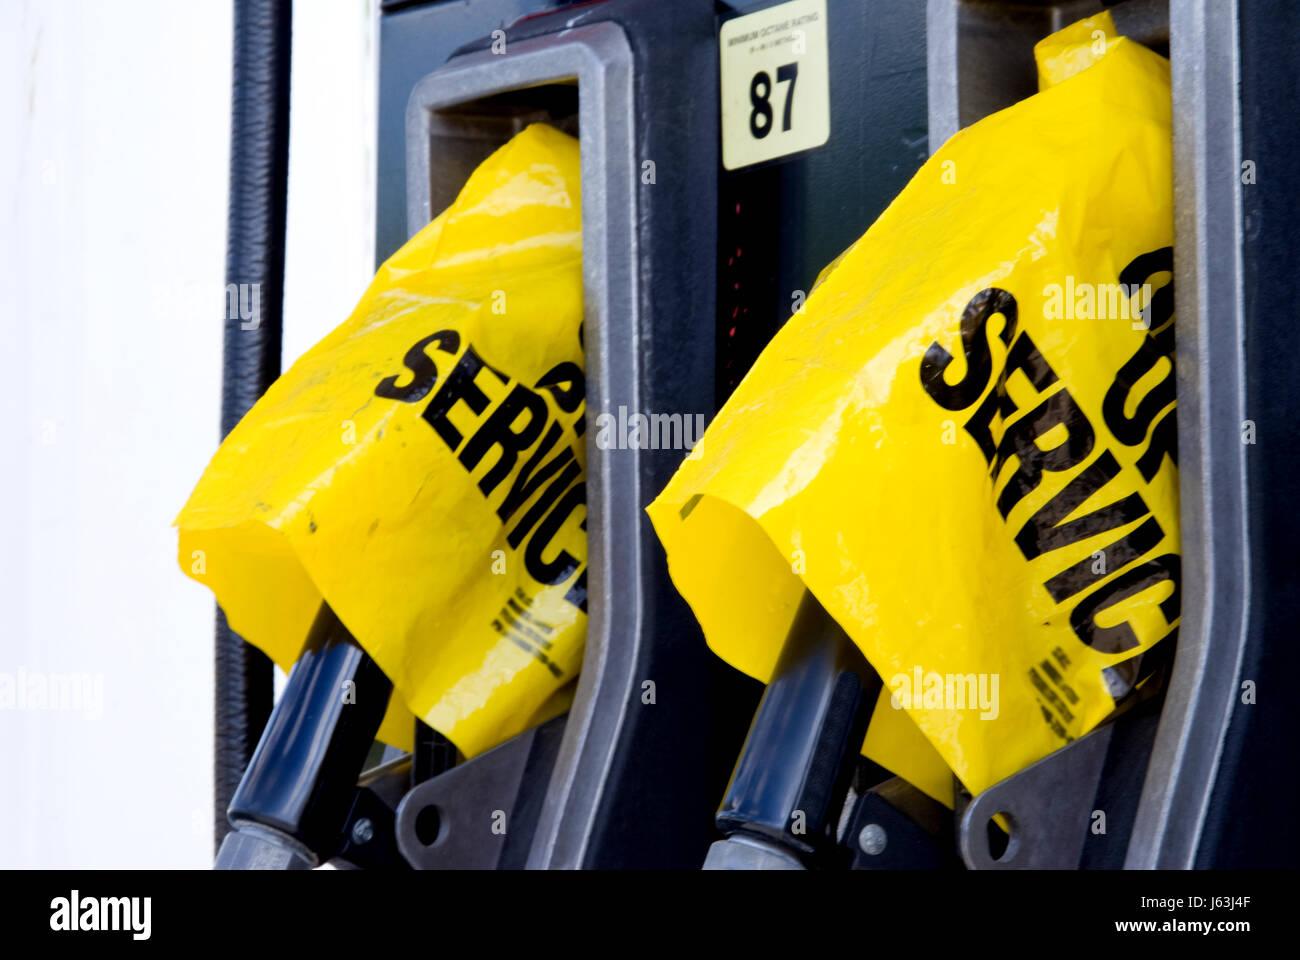 station crisis fuel gas petrol gasoline shortage pump station travel industry - Stock Image